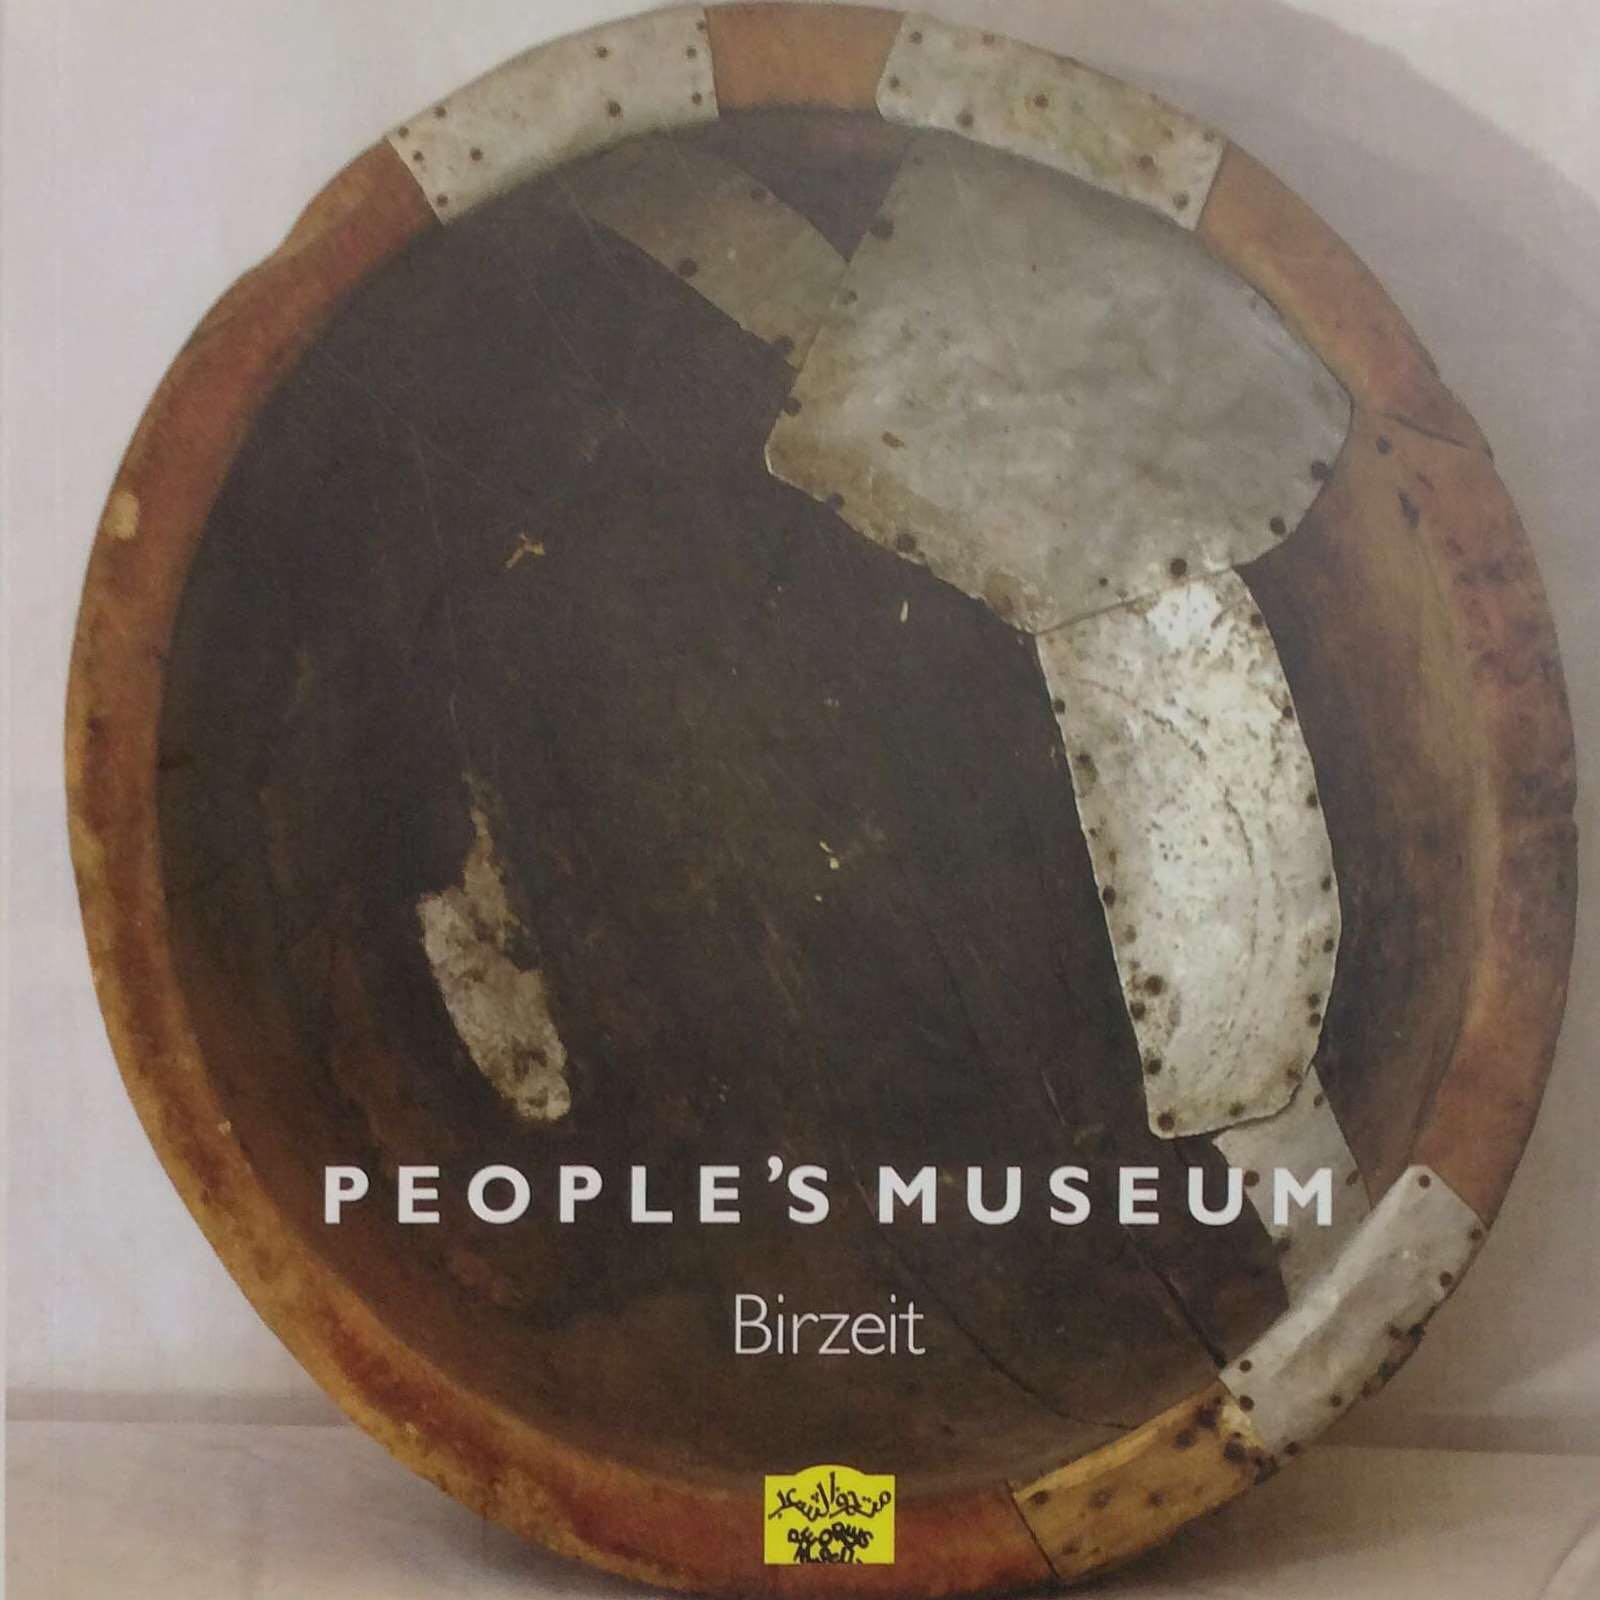 Birzeit. People's Museum